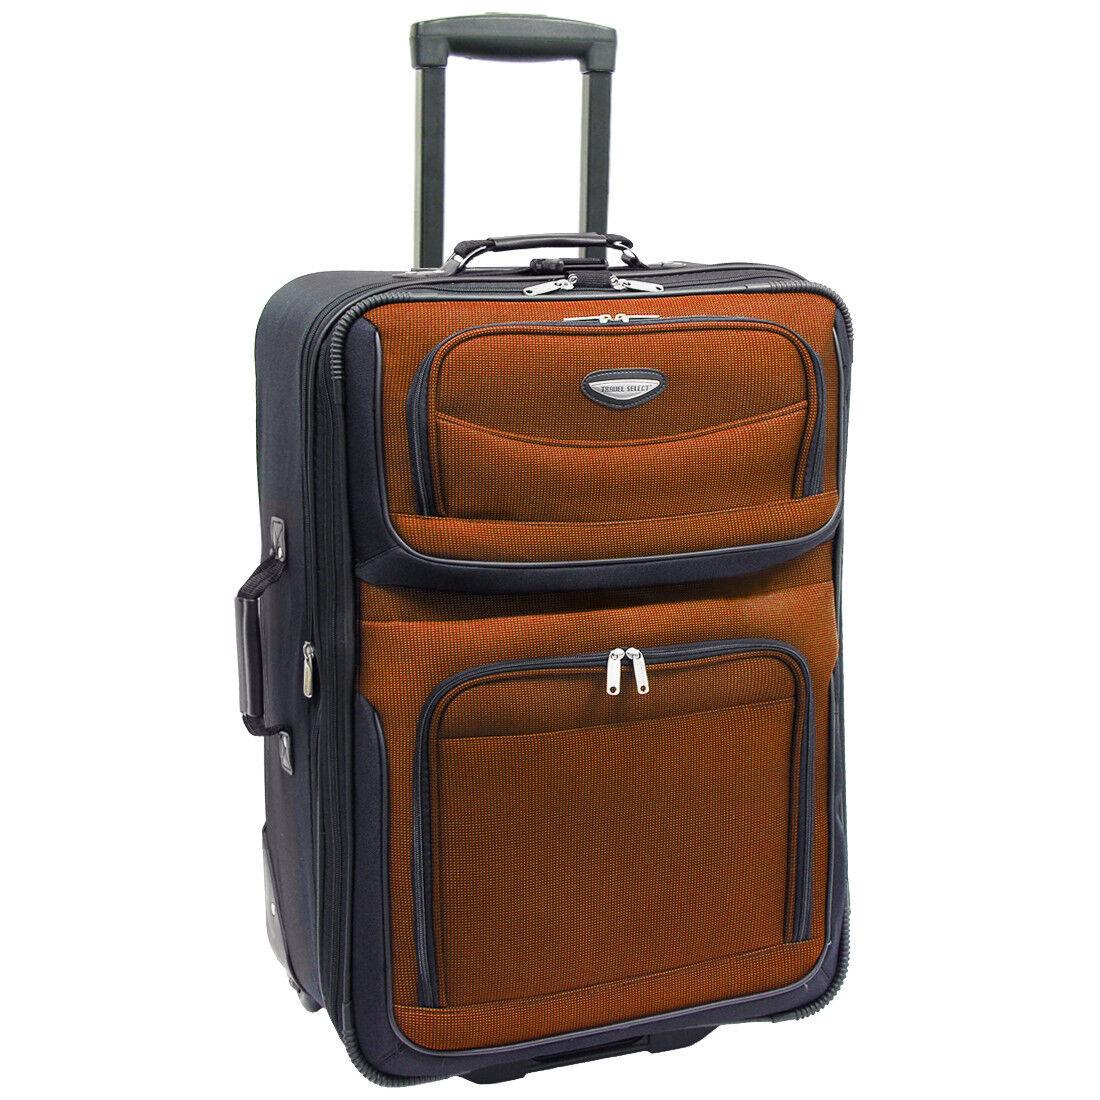 Traveler's Choice AMSTERDAM Travel/Luggage Case  for Travel